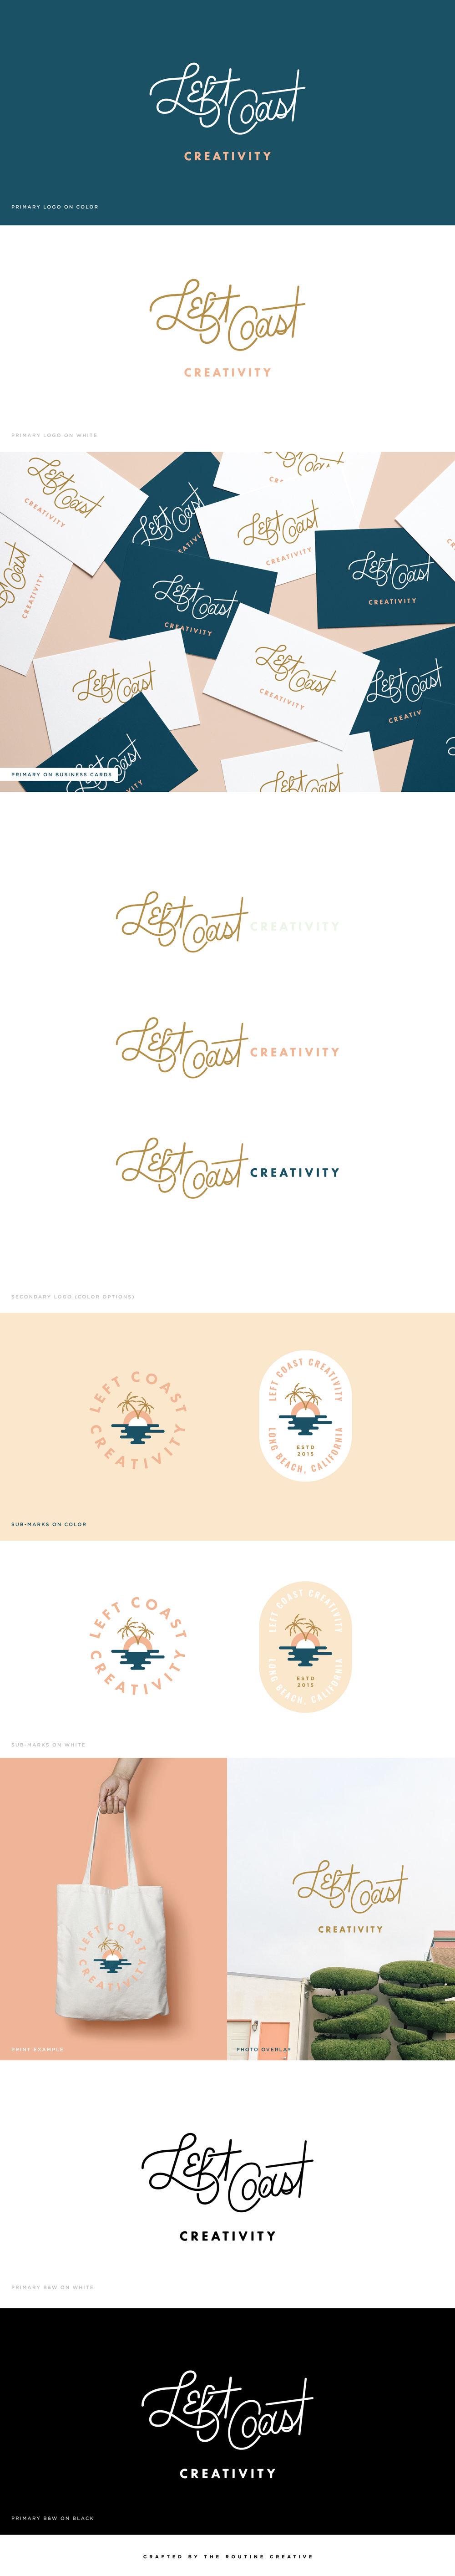 Left-Coast-Concept-2.jpg